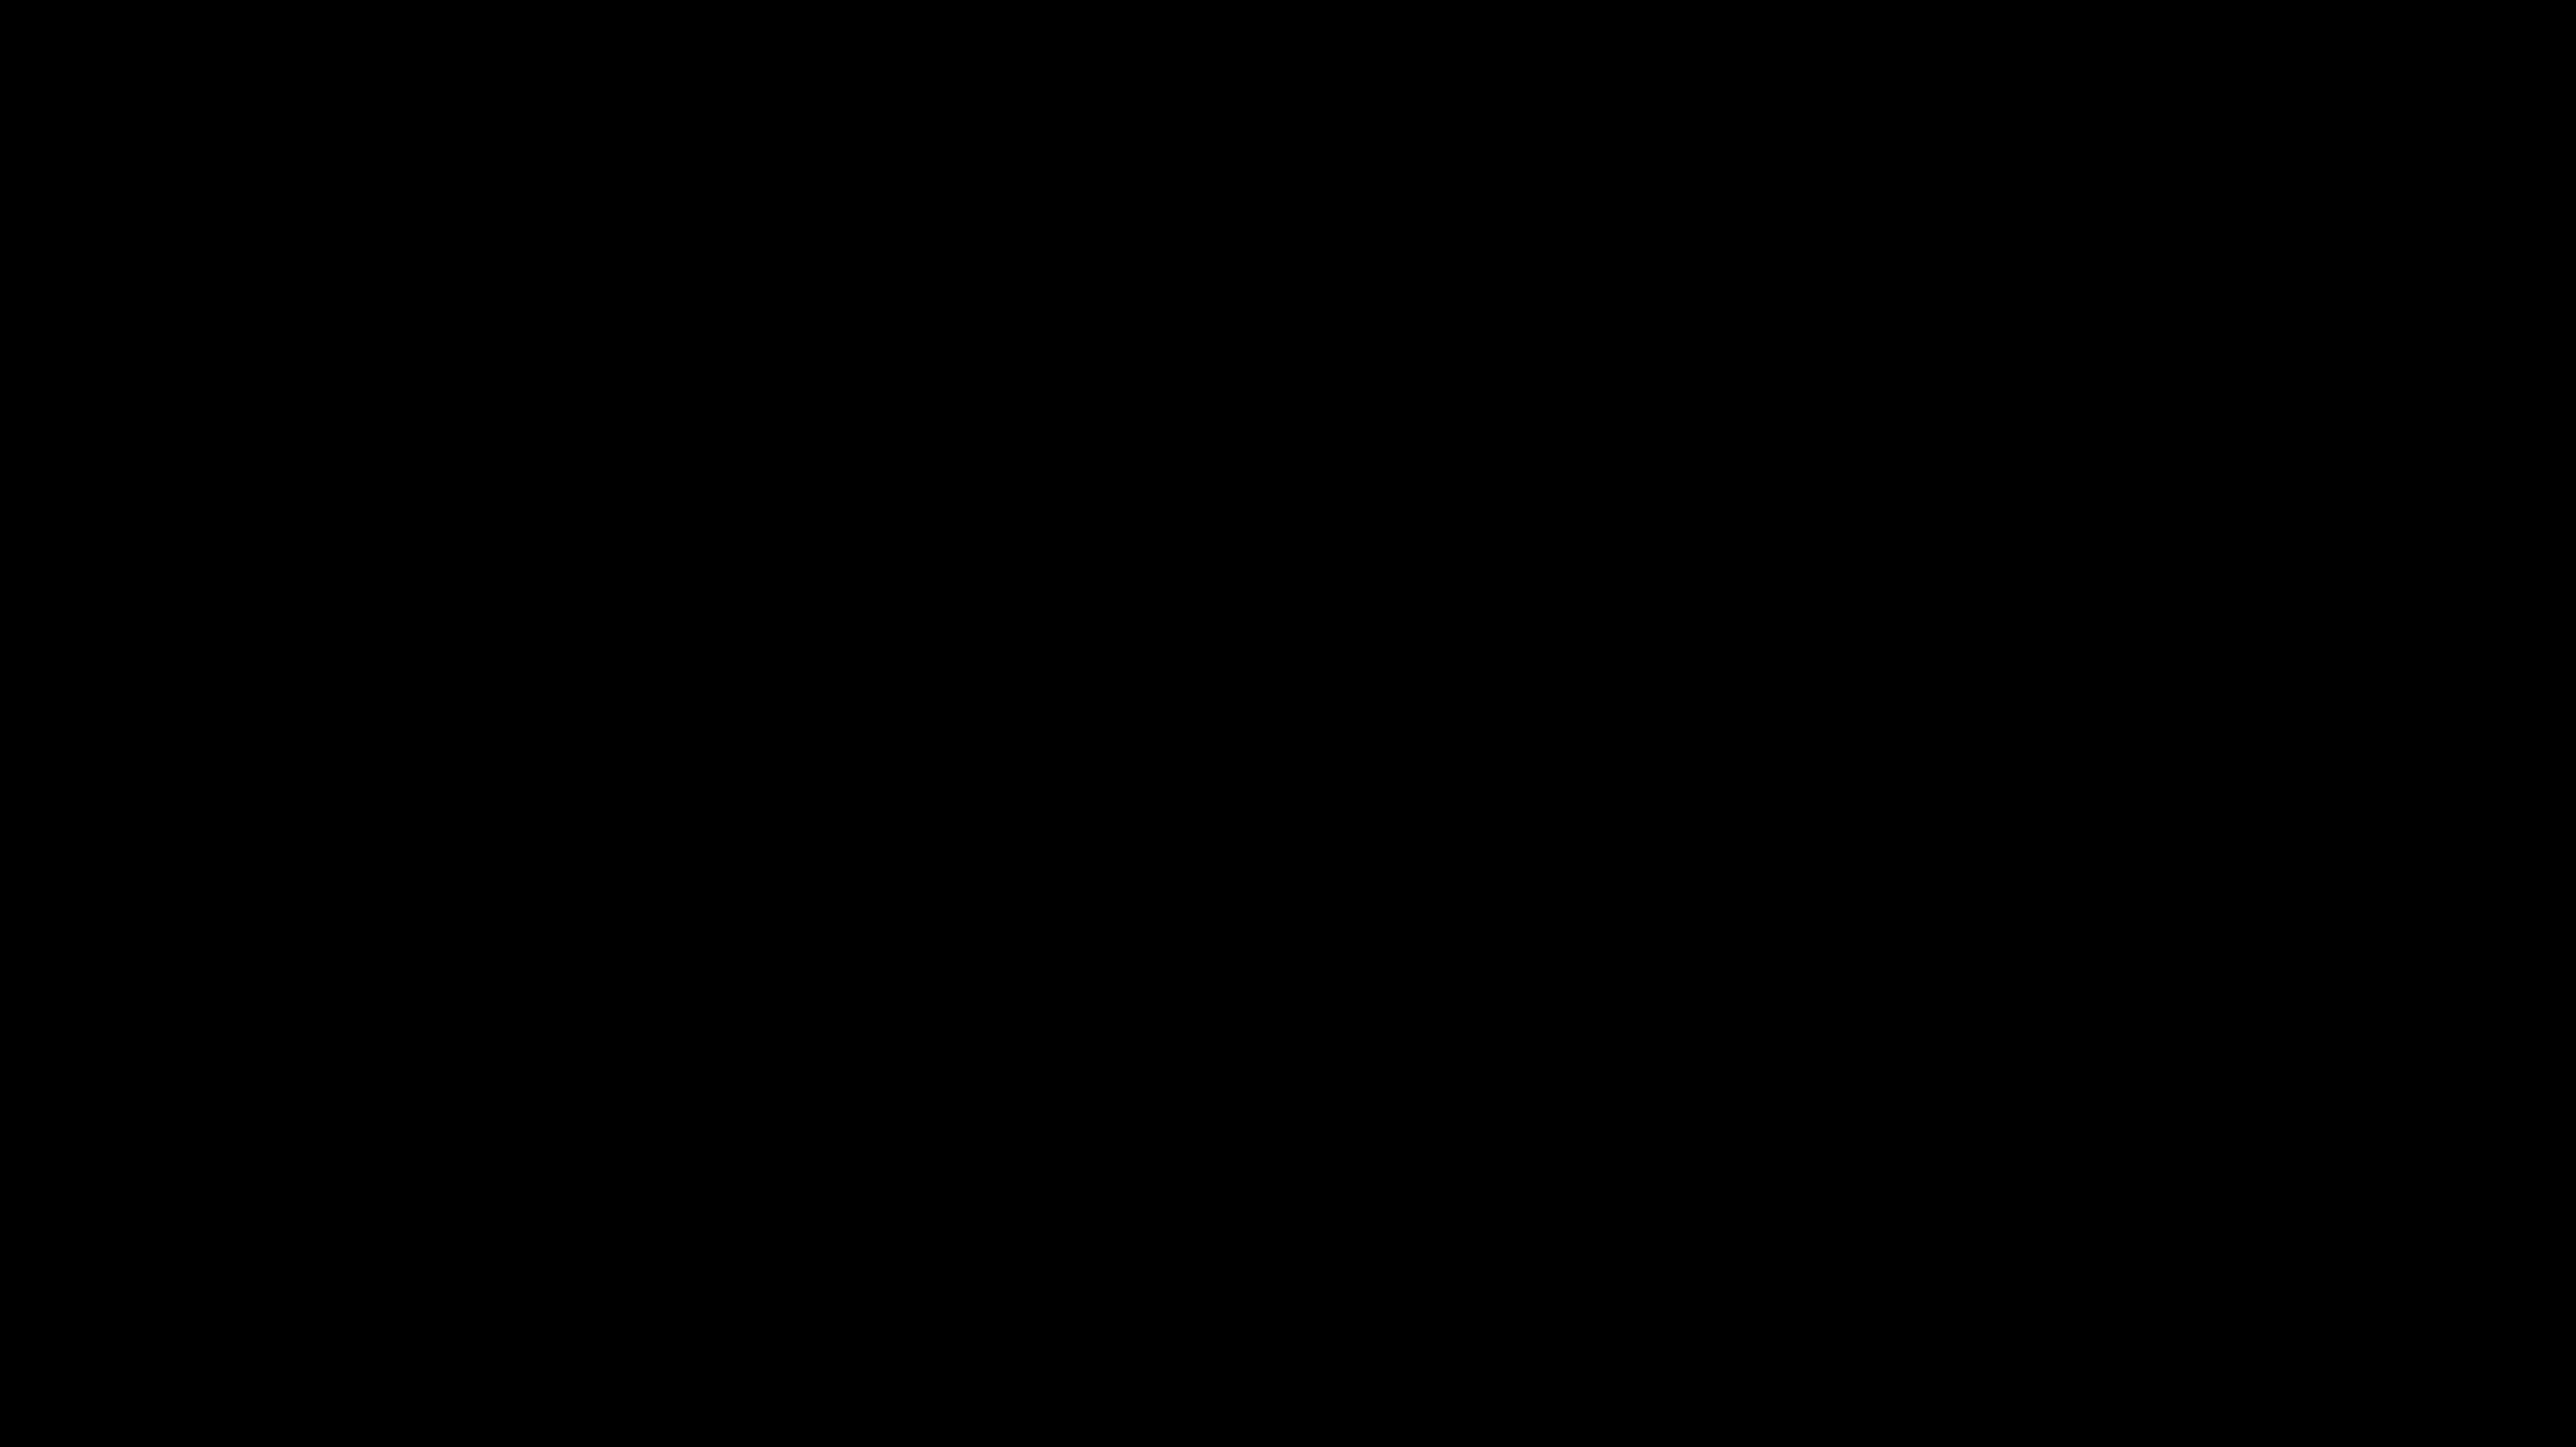 P1000058